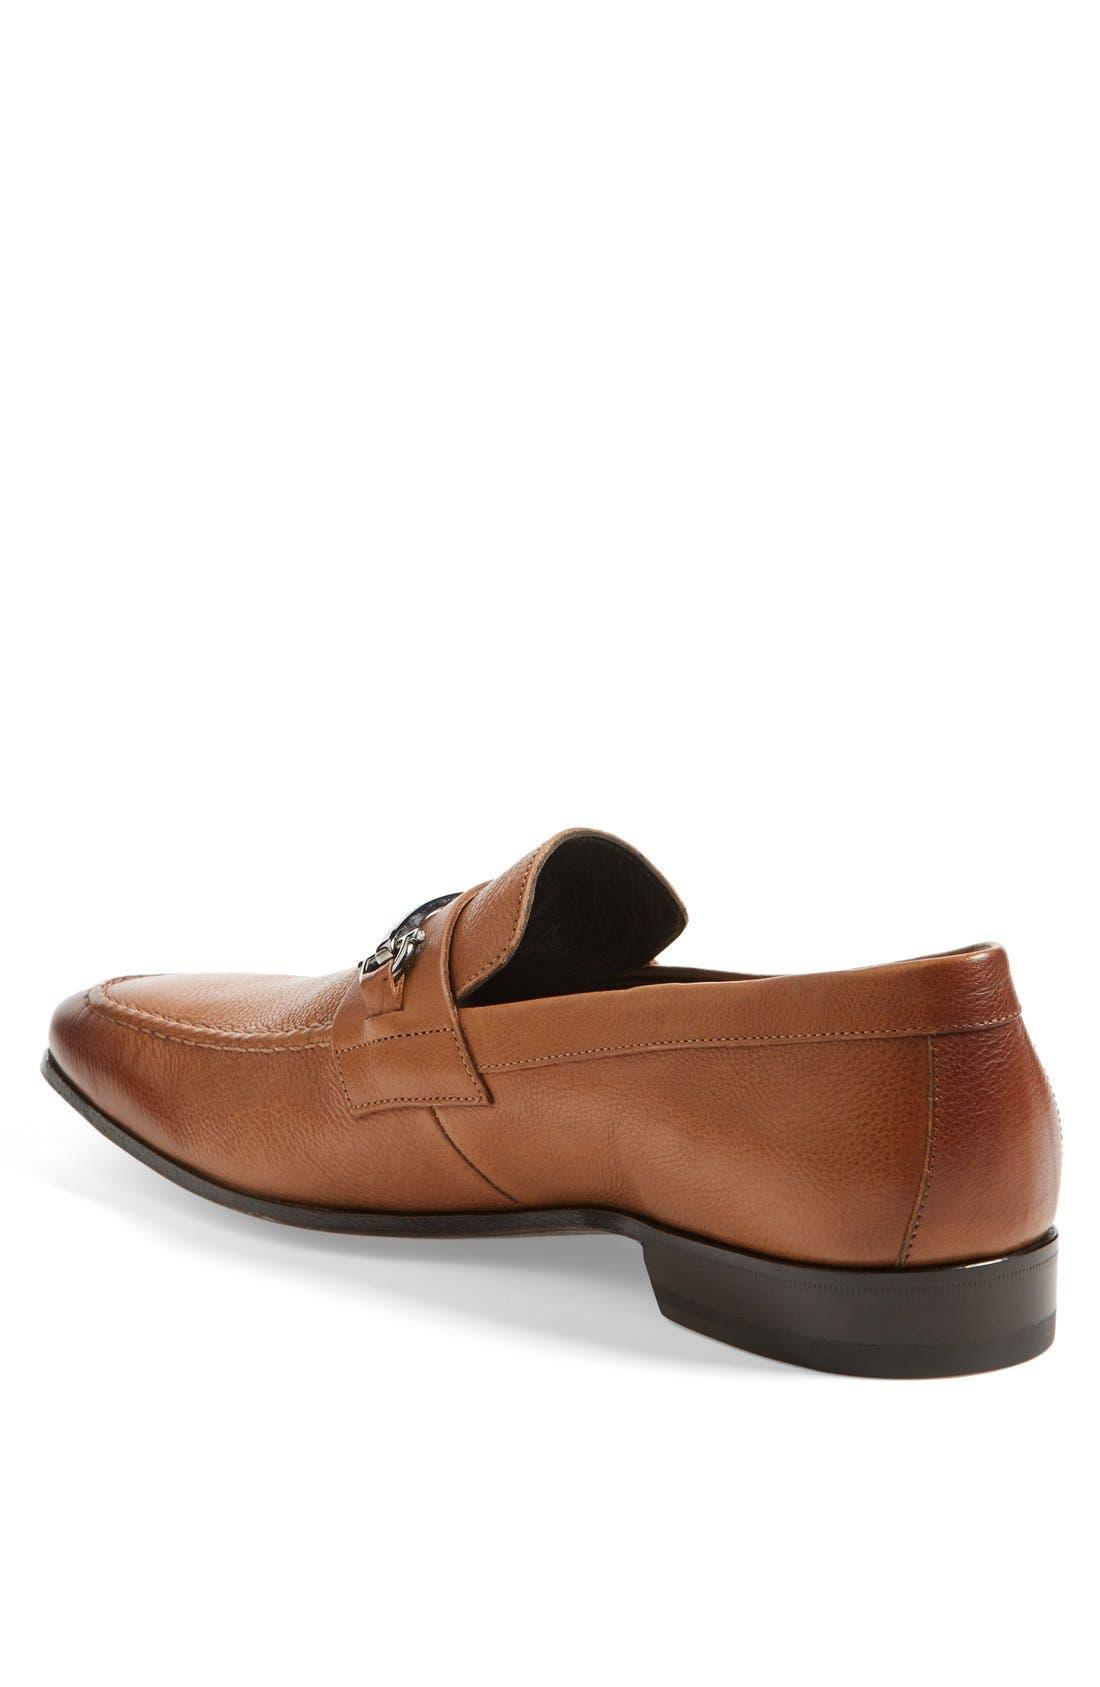 Alternate Image 2  - Bruno Magli 'Mamante II' Pebbled Leather Loafer